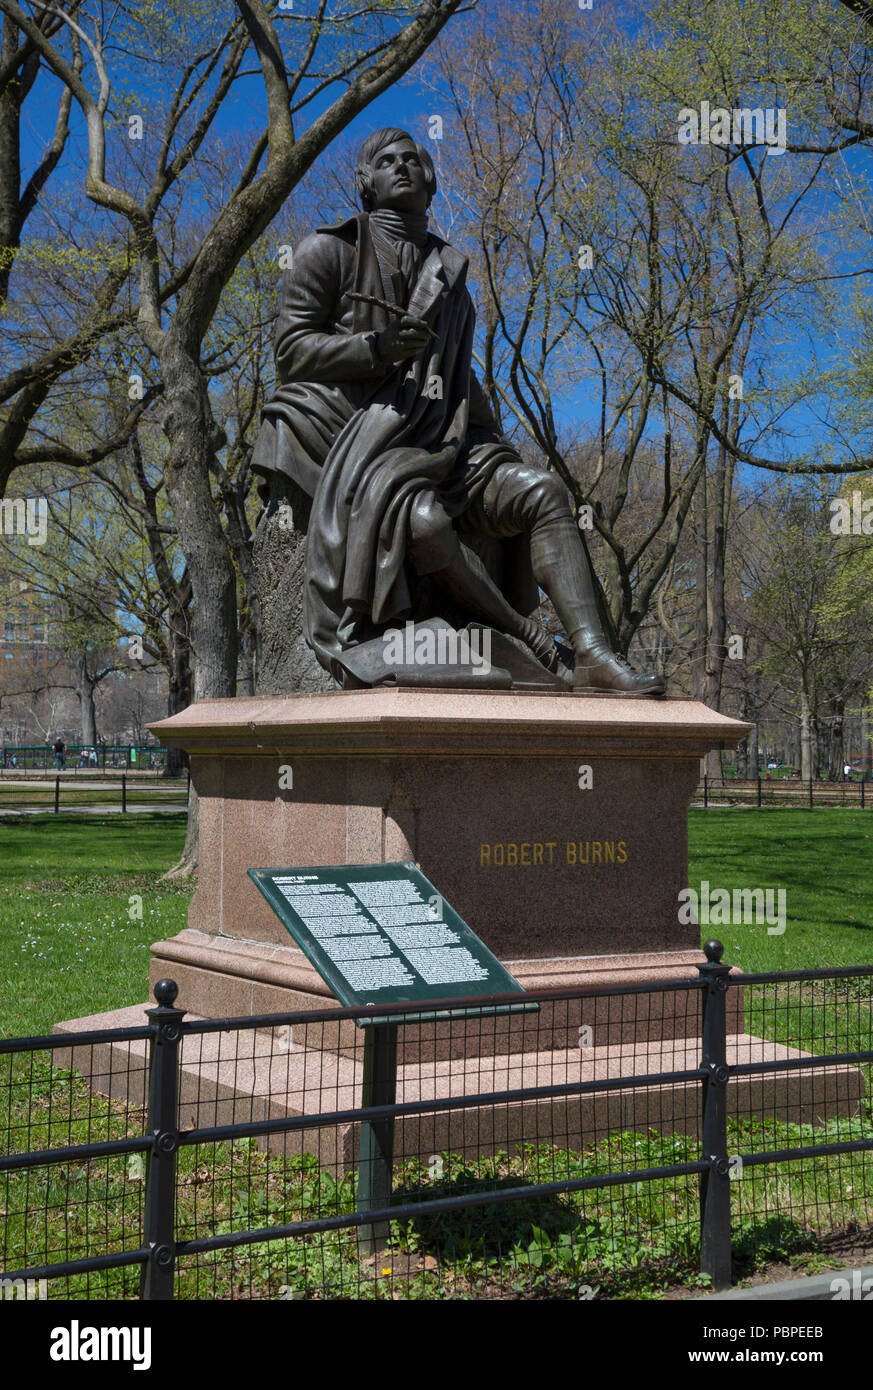 Robert Burns sculpture by John Steell in Central Park, New York, USA Stock Photo